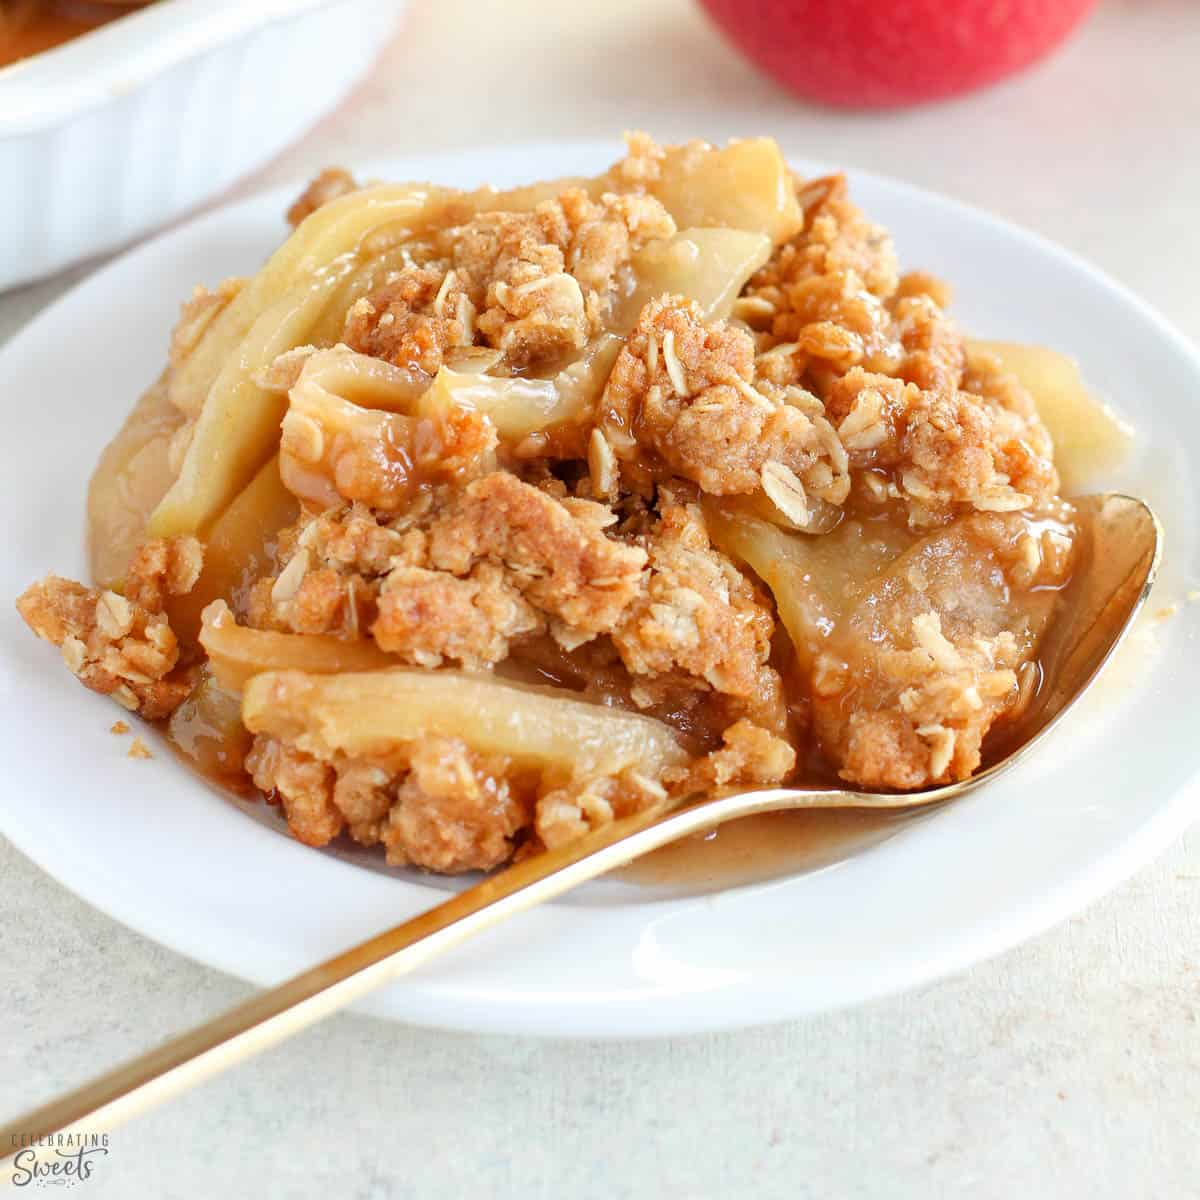 Apple Crisp Recipe Celebrating Sweets